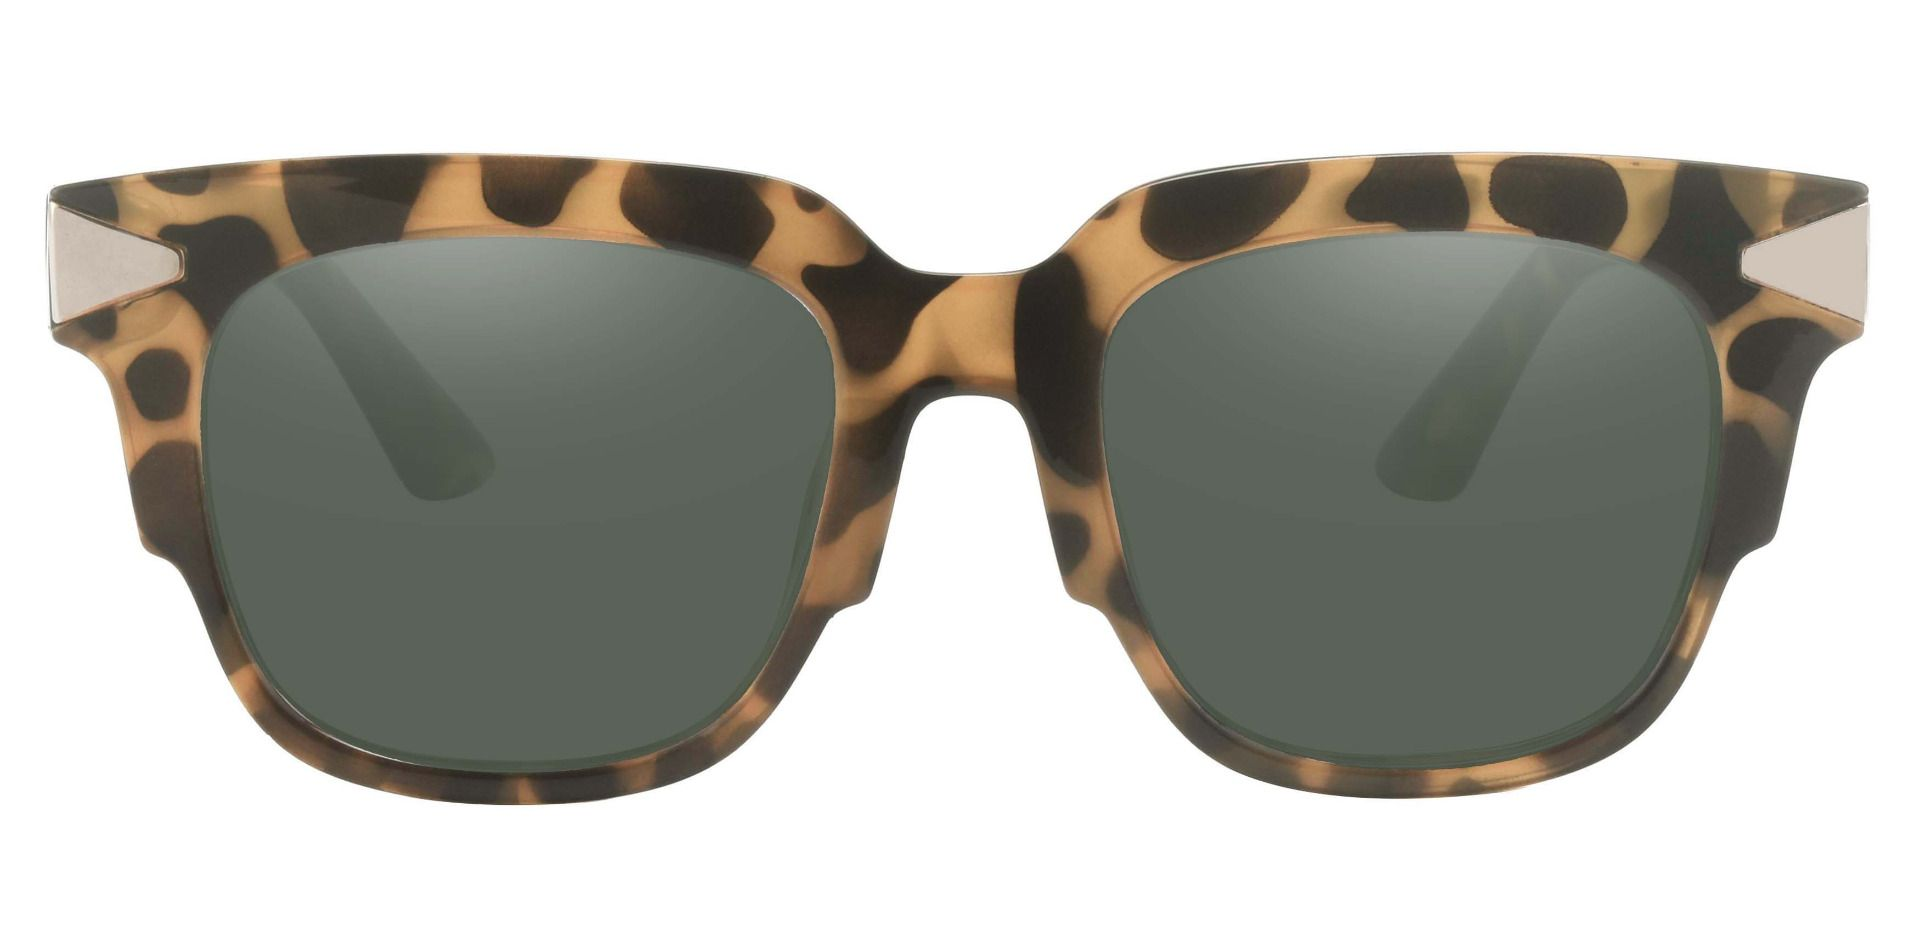 Ardent Square Reading Sunglasses - Tortoise Frame With Green Lenses